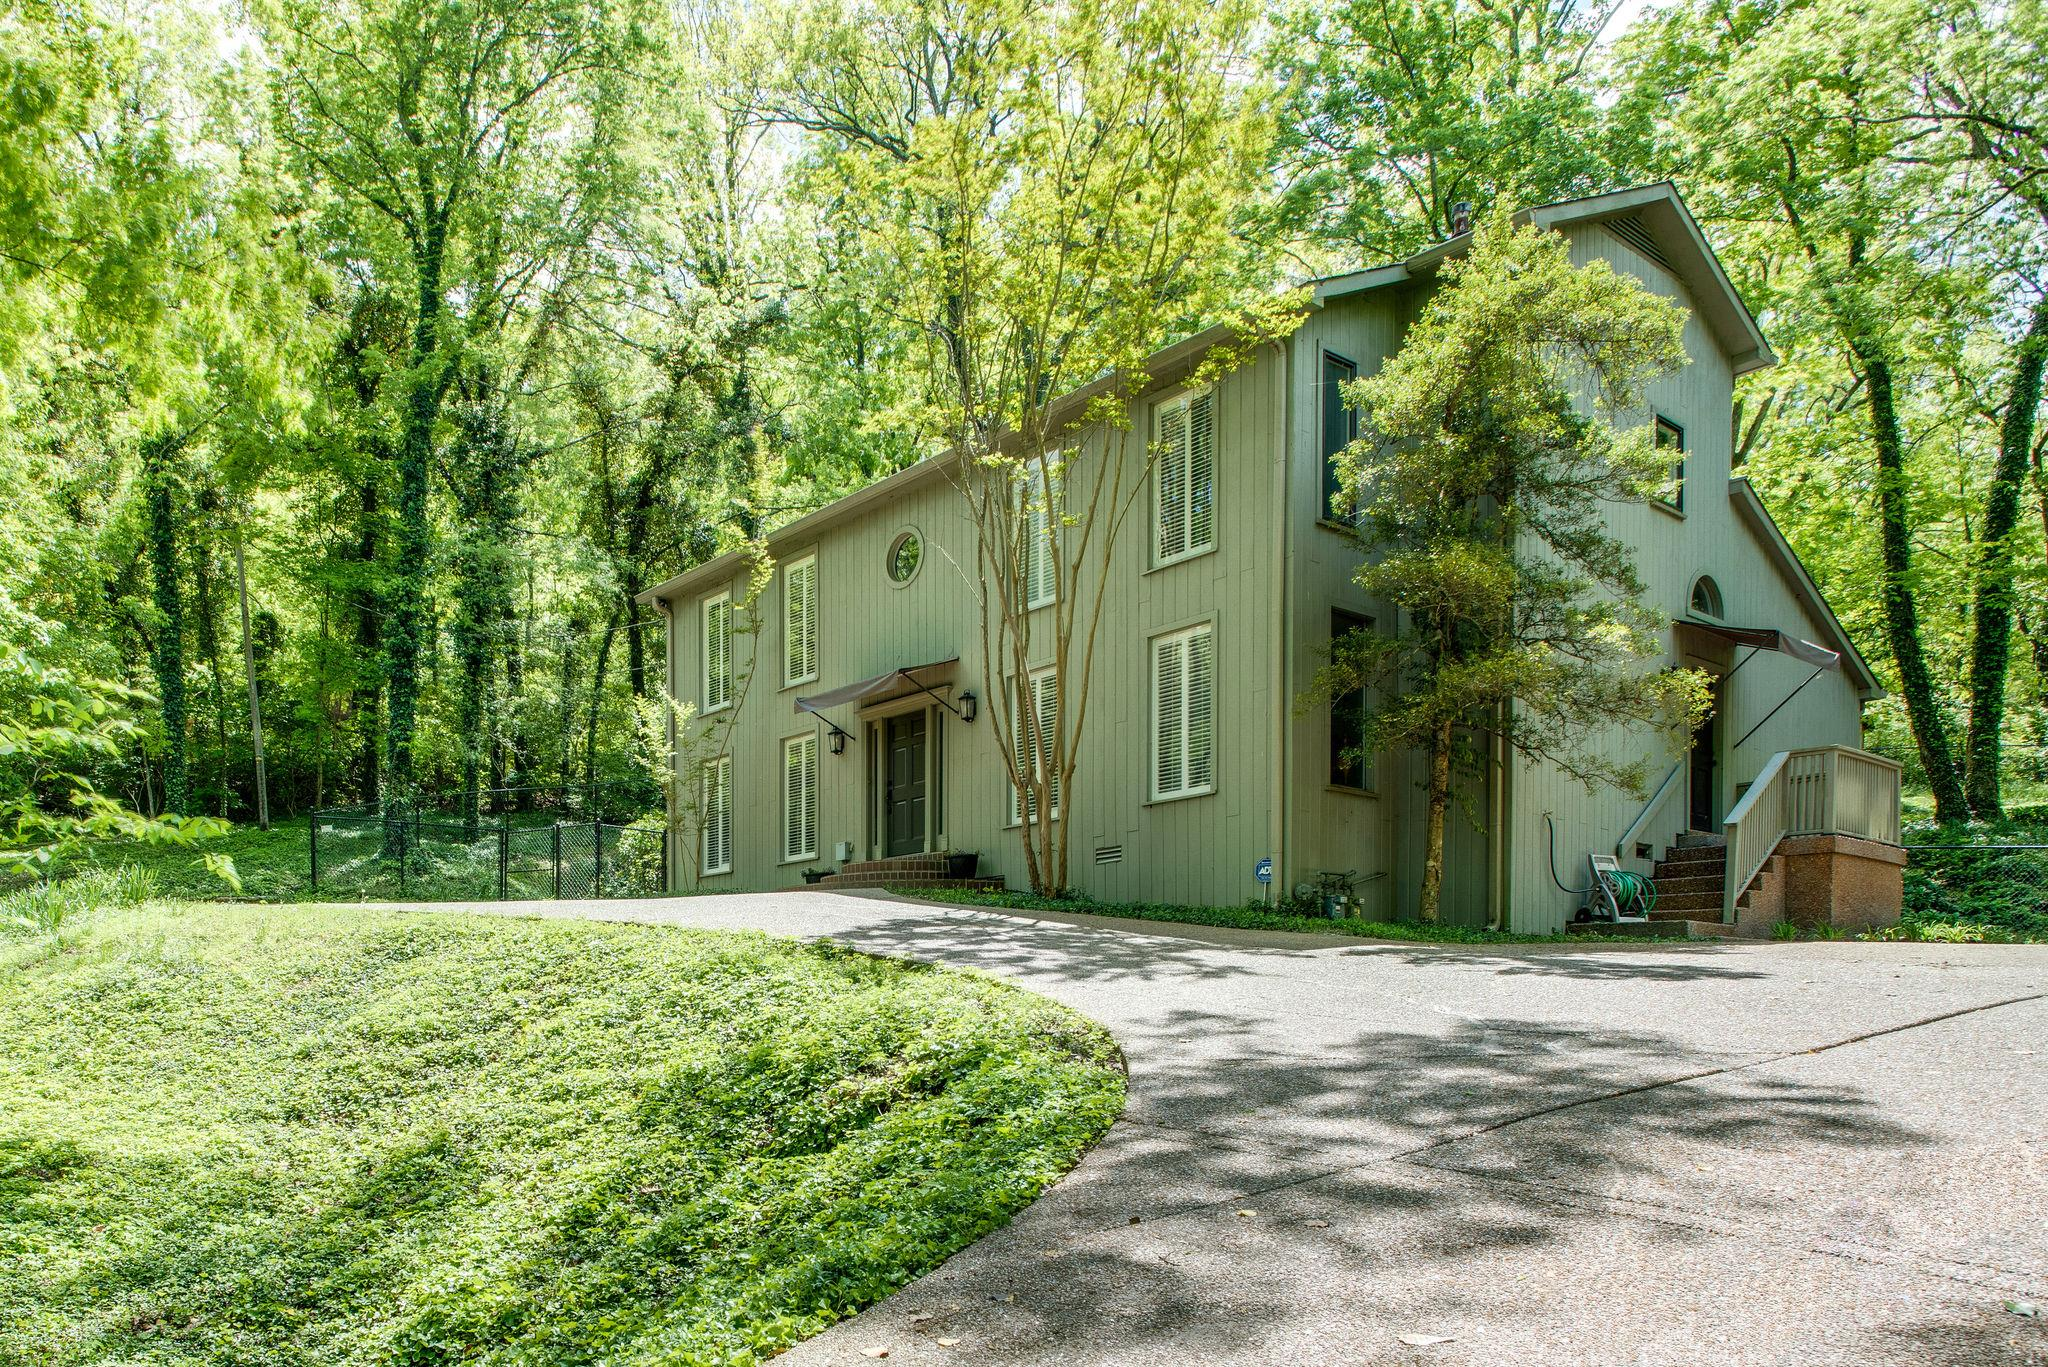 707 Hillwood Blvd, Nashville, TN 37205 - Nashville, TN real estate listing